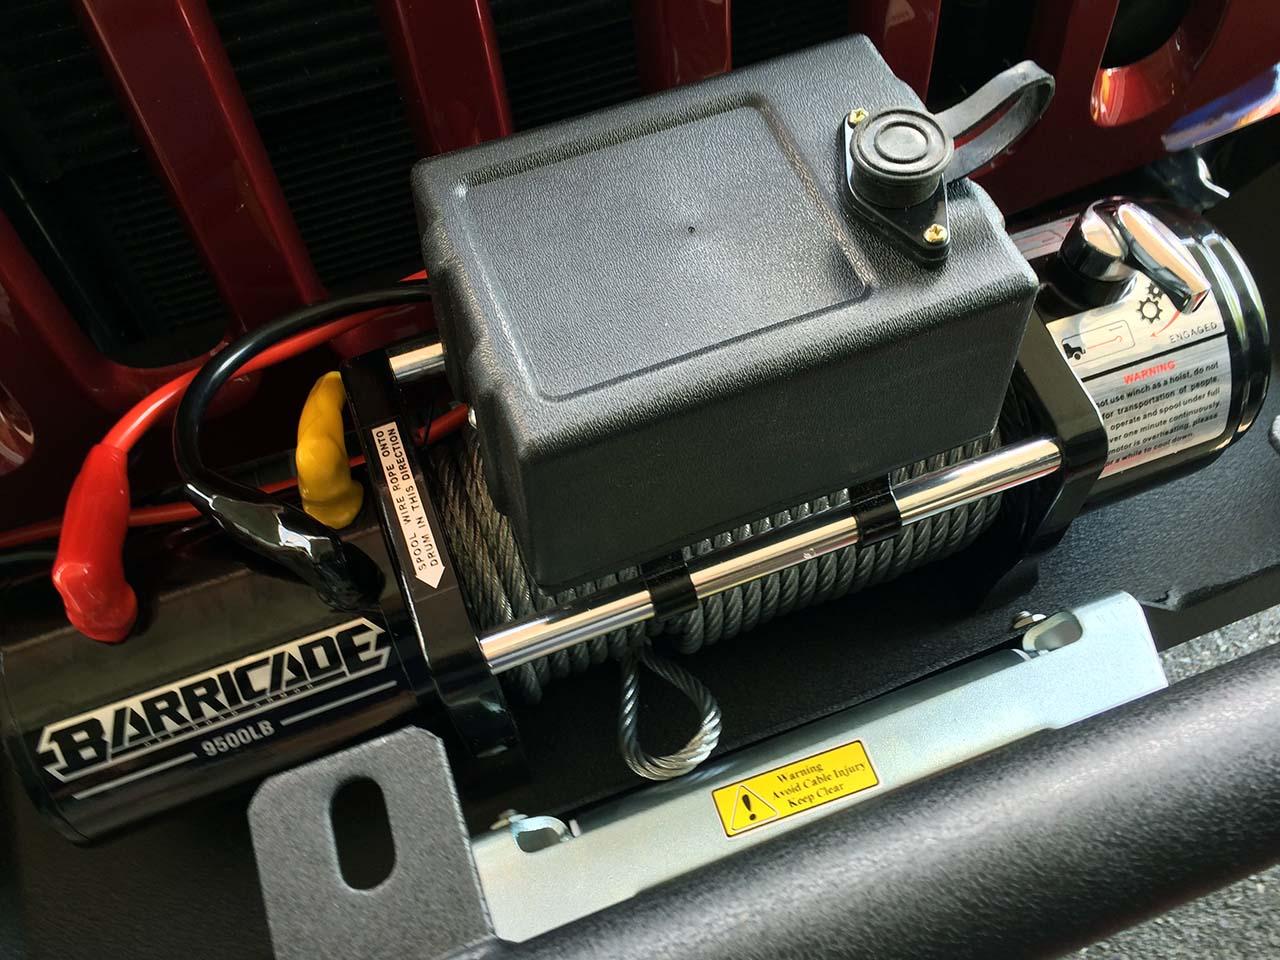 barricade 9500lb winch install jeep wrangler jk wiring. Black Bedroom Furniture Sets. Home Design Ideas